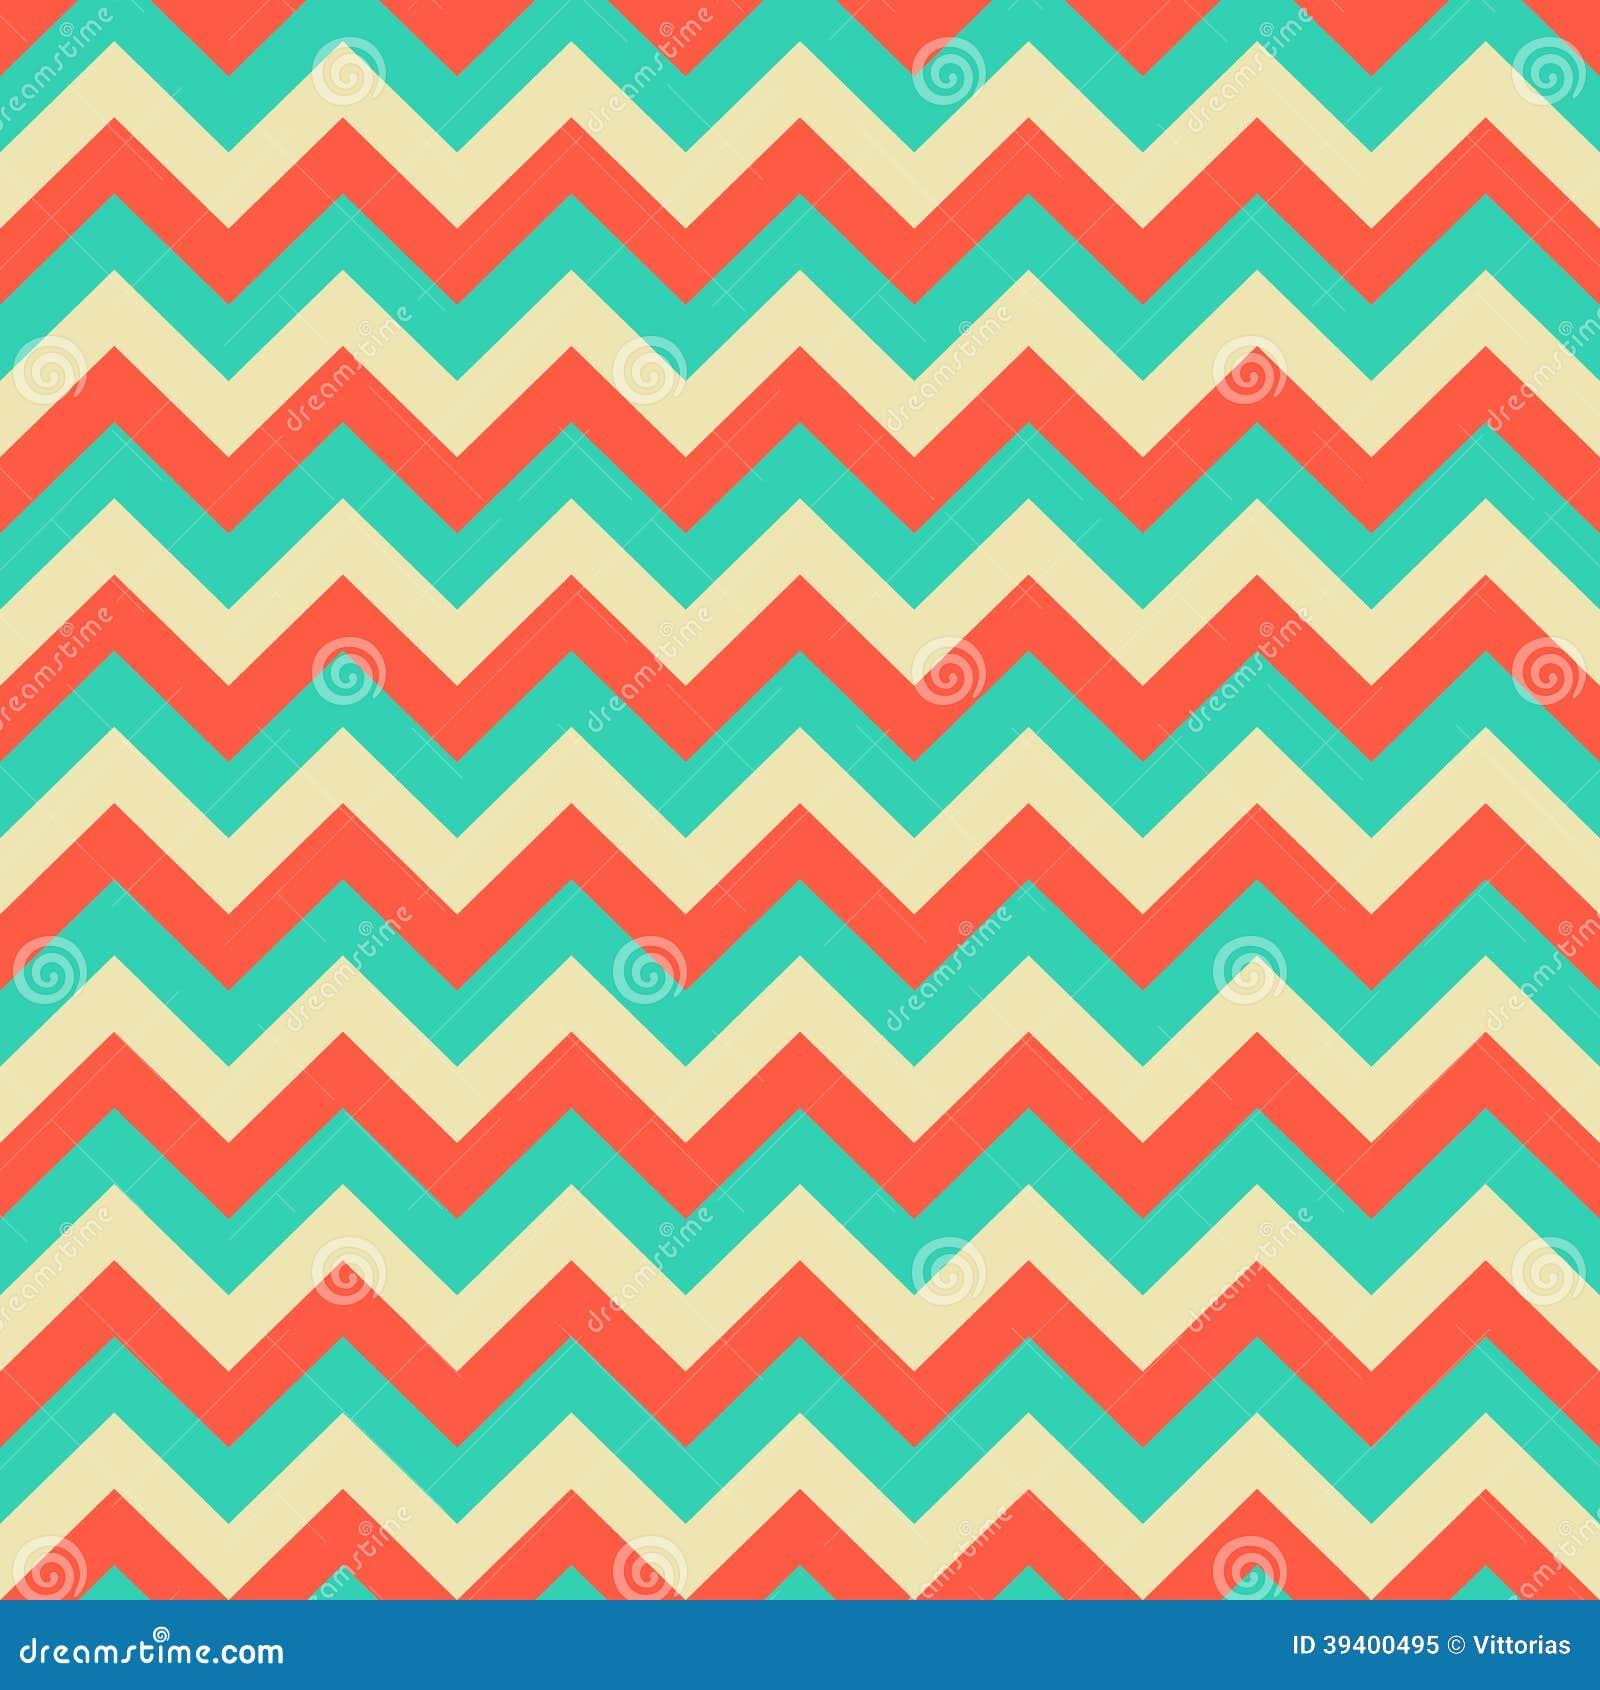 seamless chevron pattern stock vector image 39400495 lion head clipart lion head clip art jpg